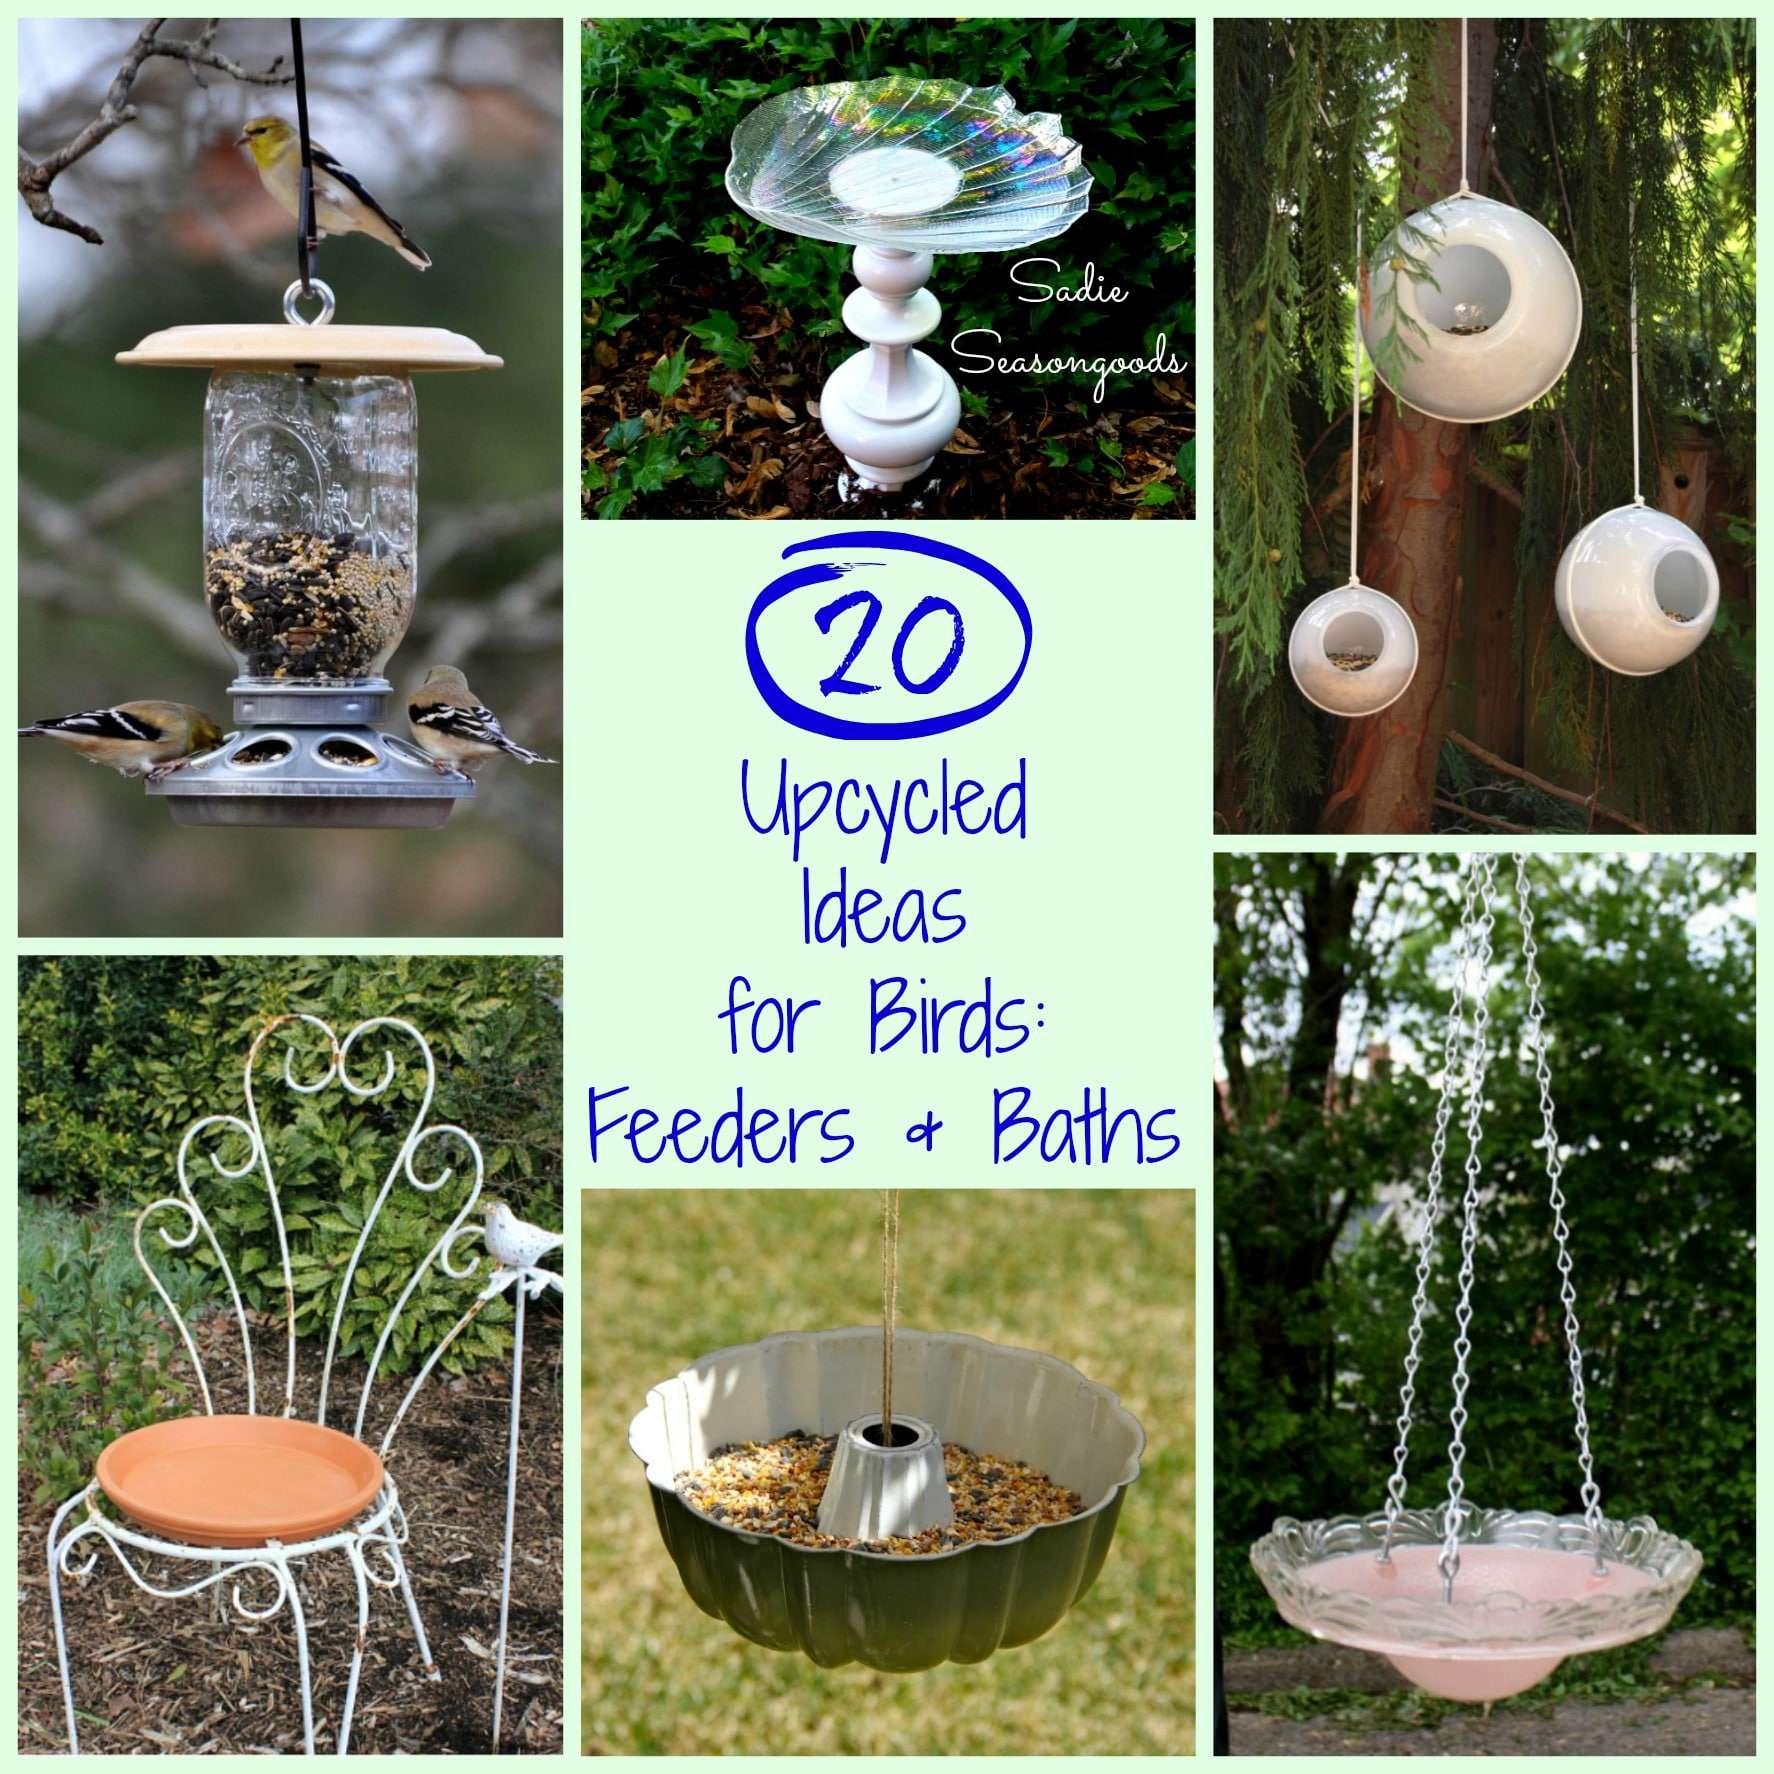 Sadie_Seasongoods_upcyled_bird_feeder_bath_ideas